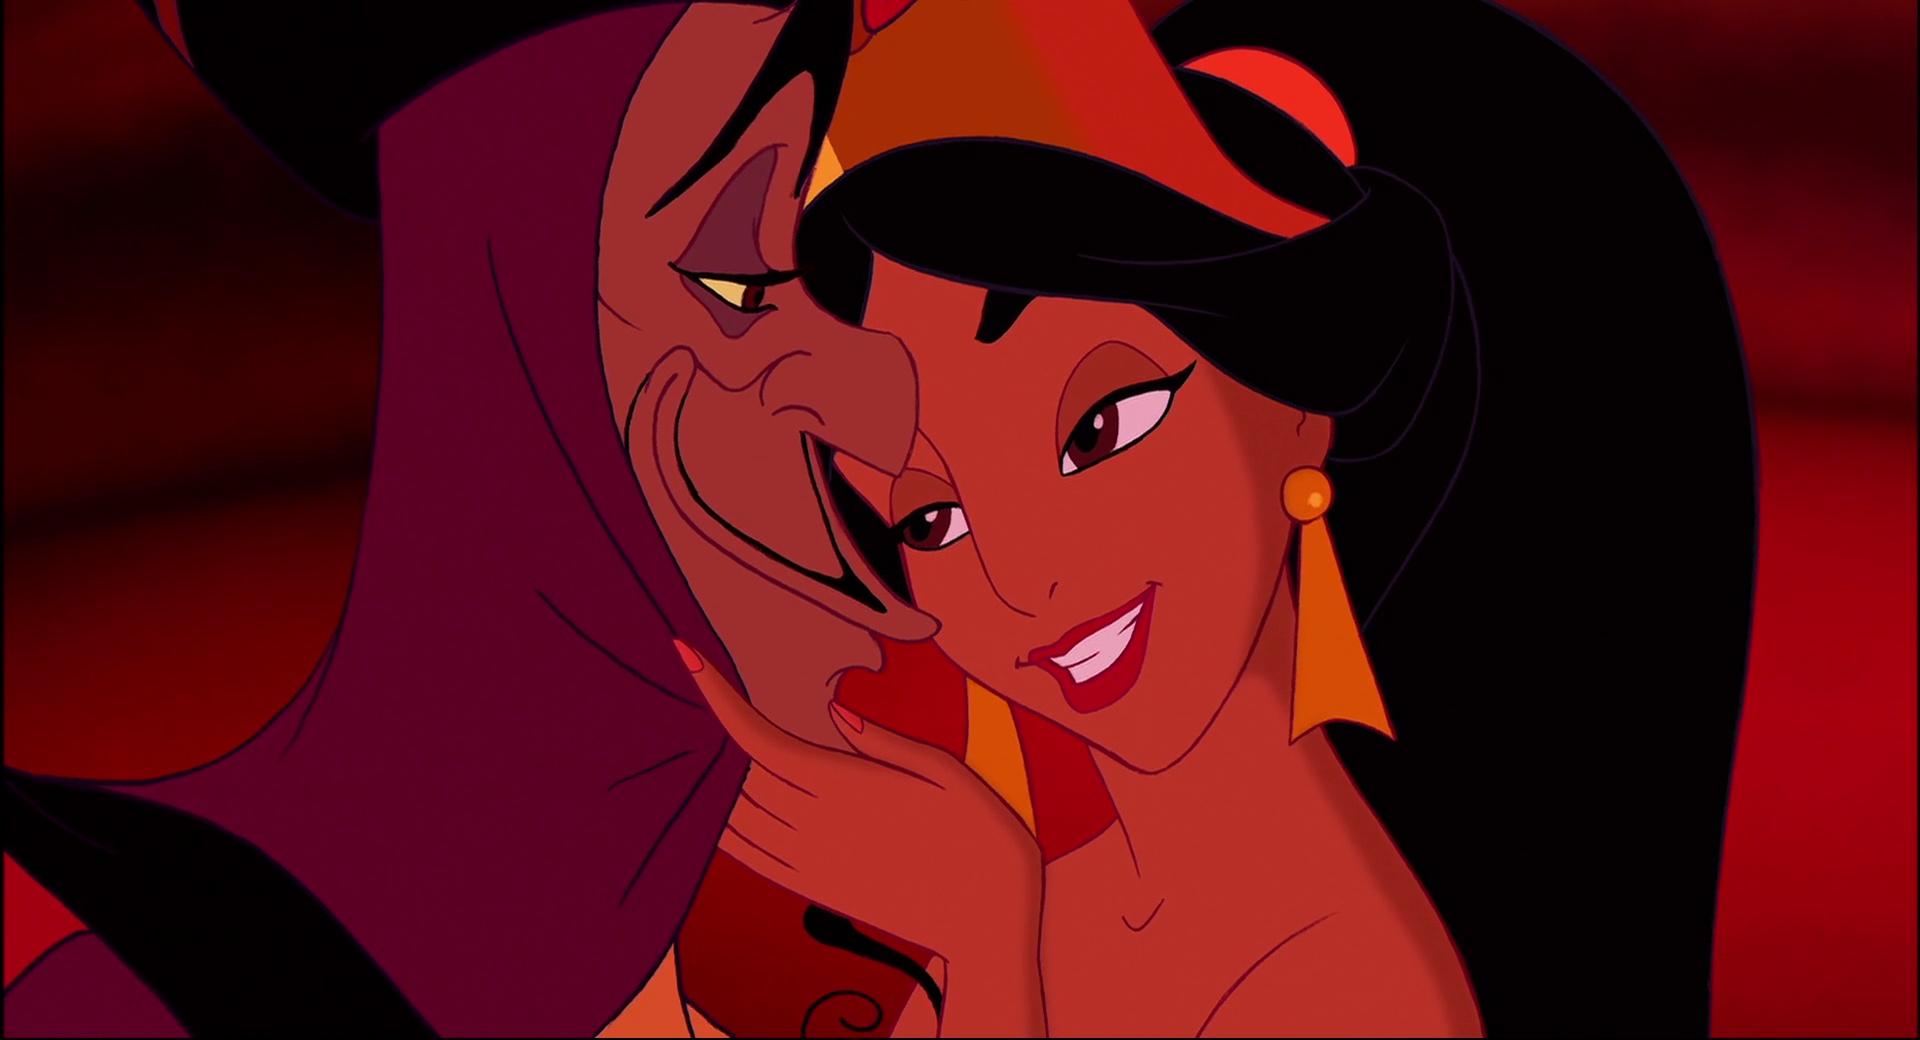 File:Disney-females 128153 6.jpg